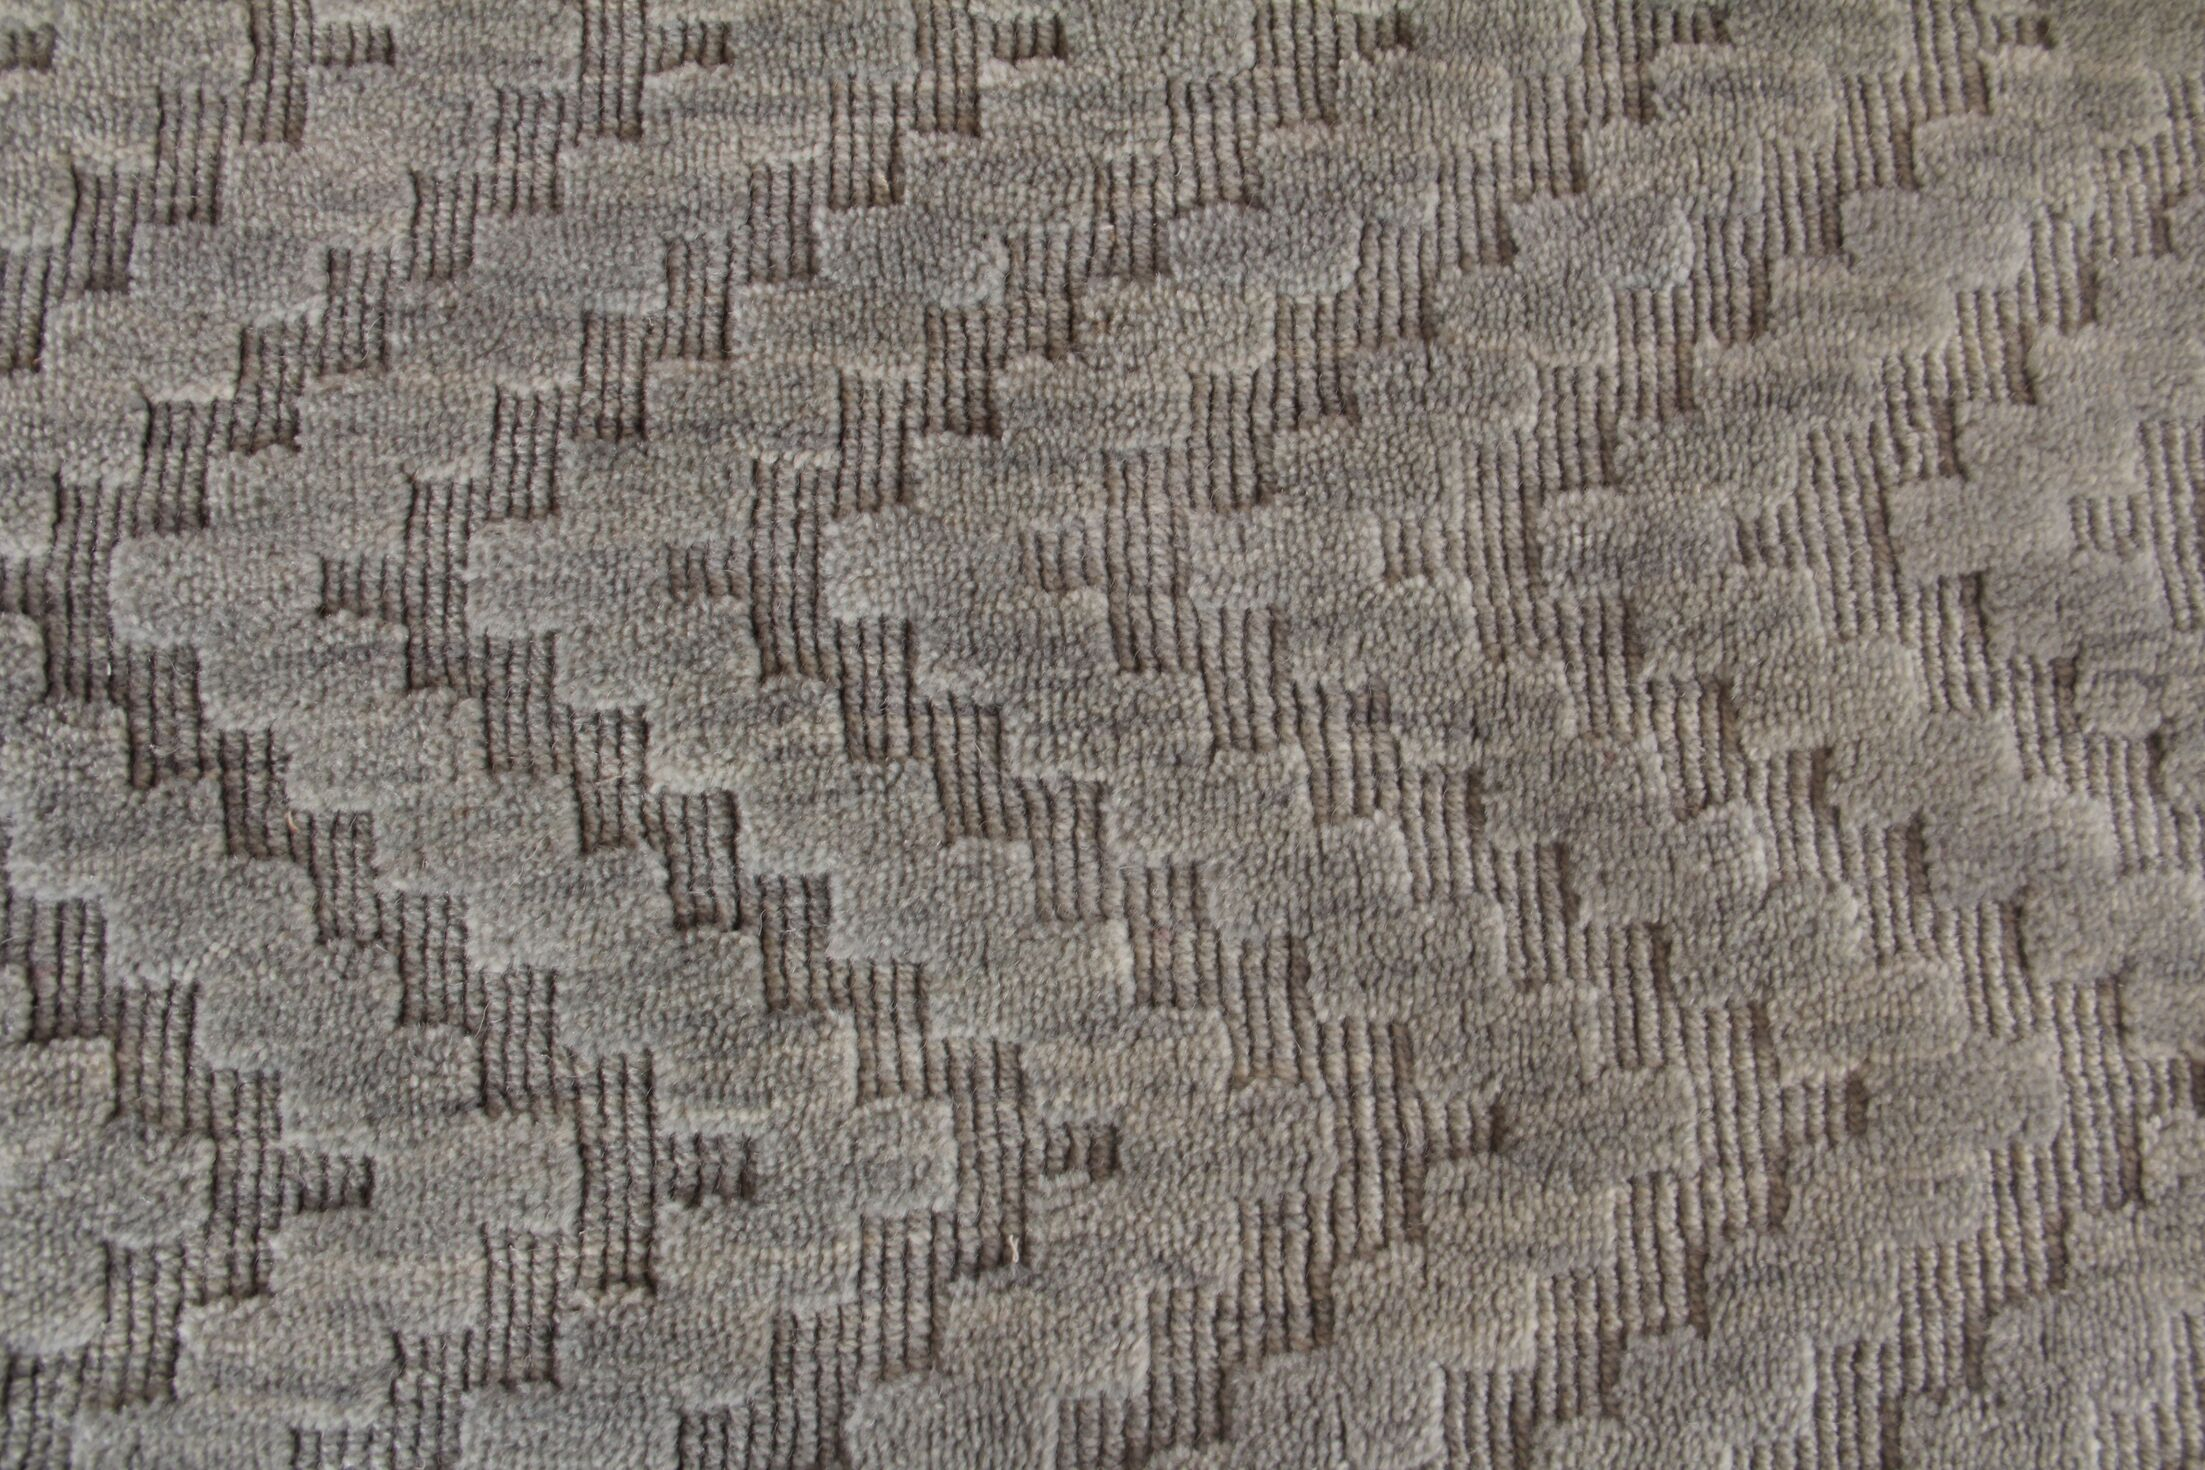 Demani Hand Woven Wool Gray Area Rug Rug Size: Rectangle 10' x 14'